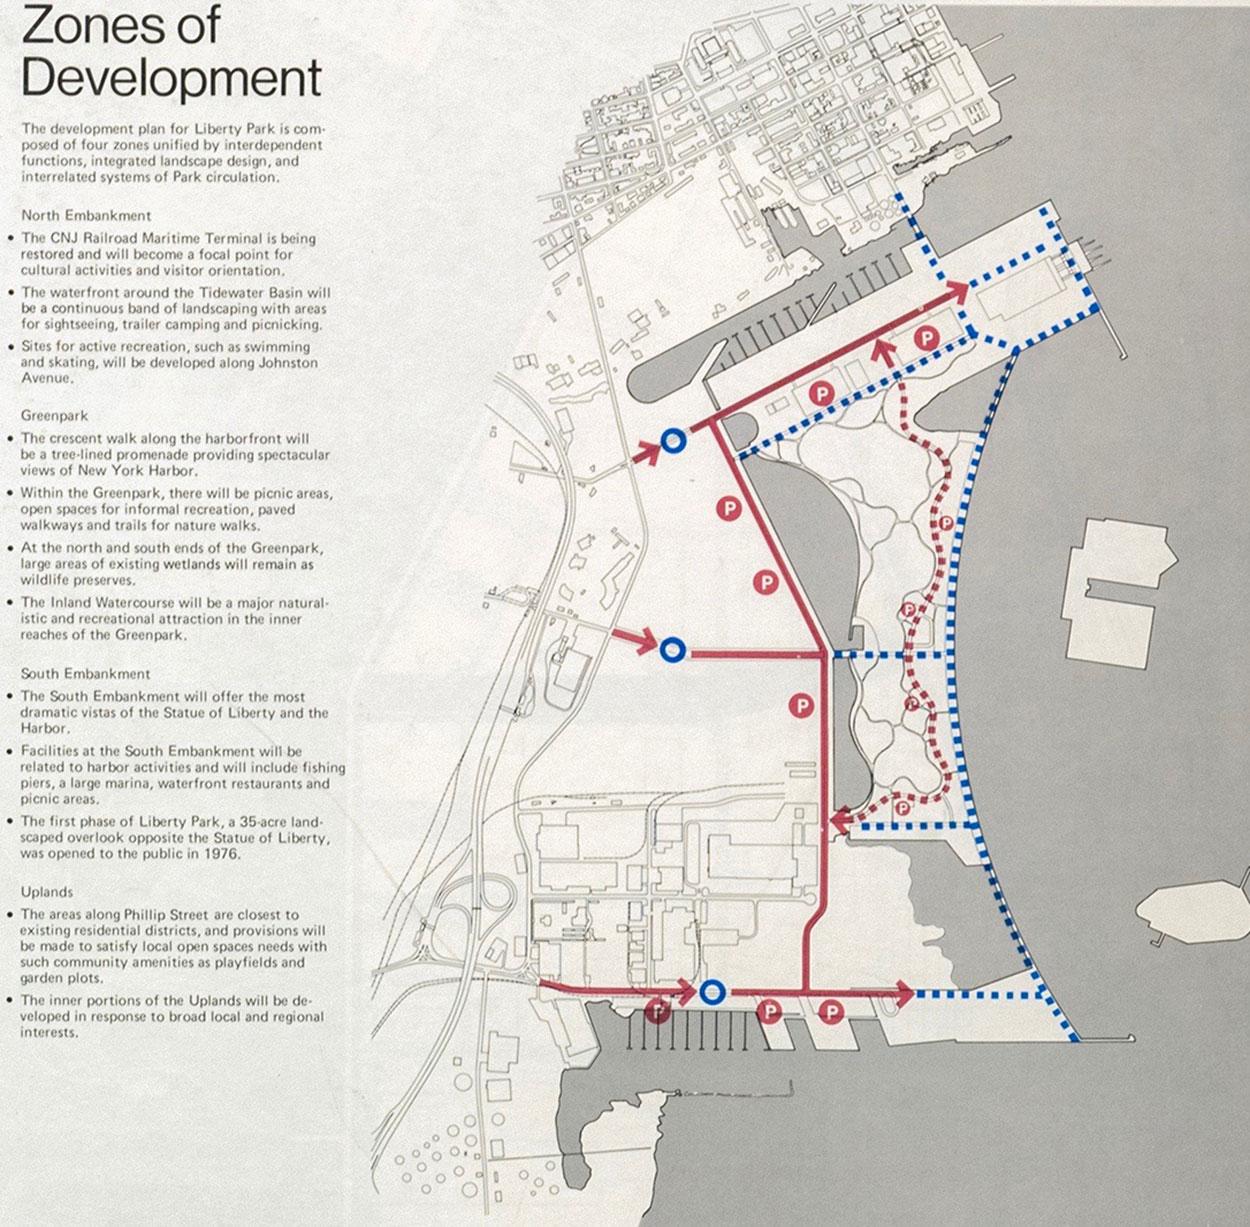 Detail Zones of Development